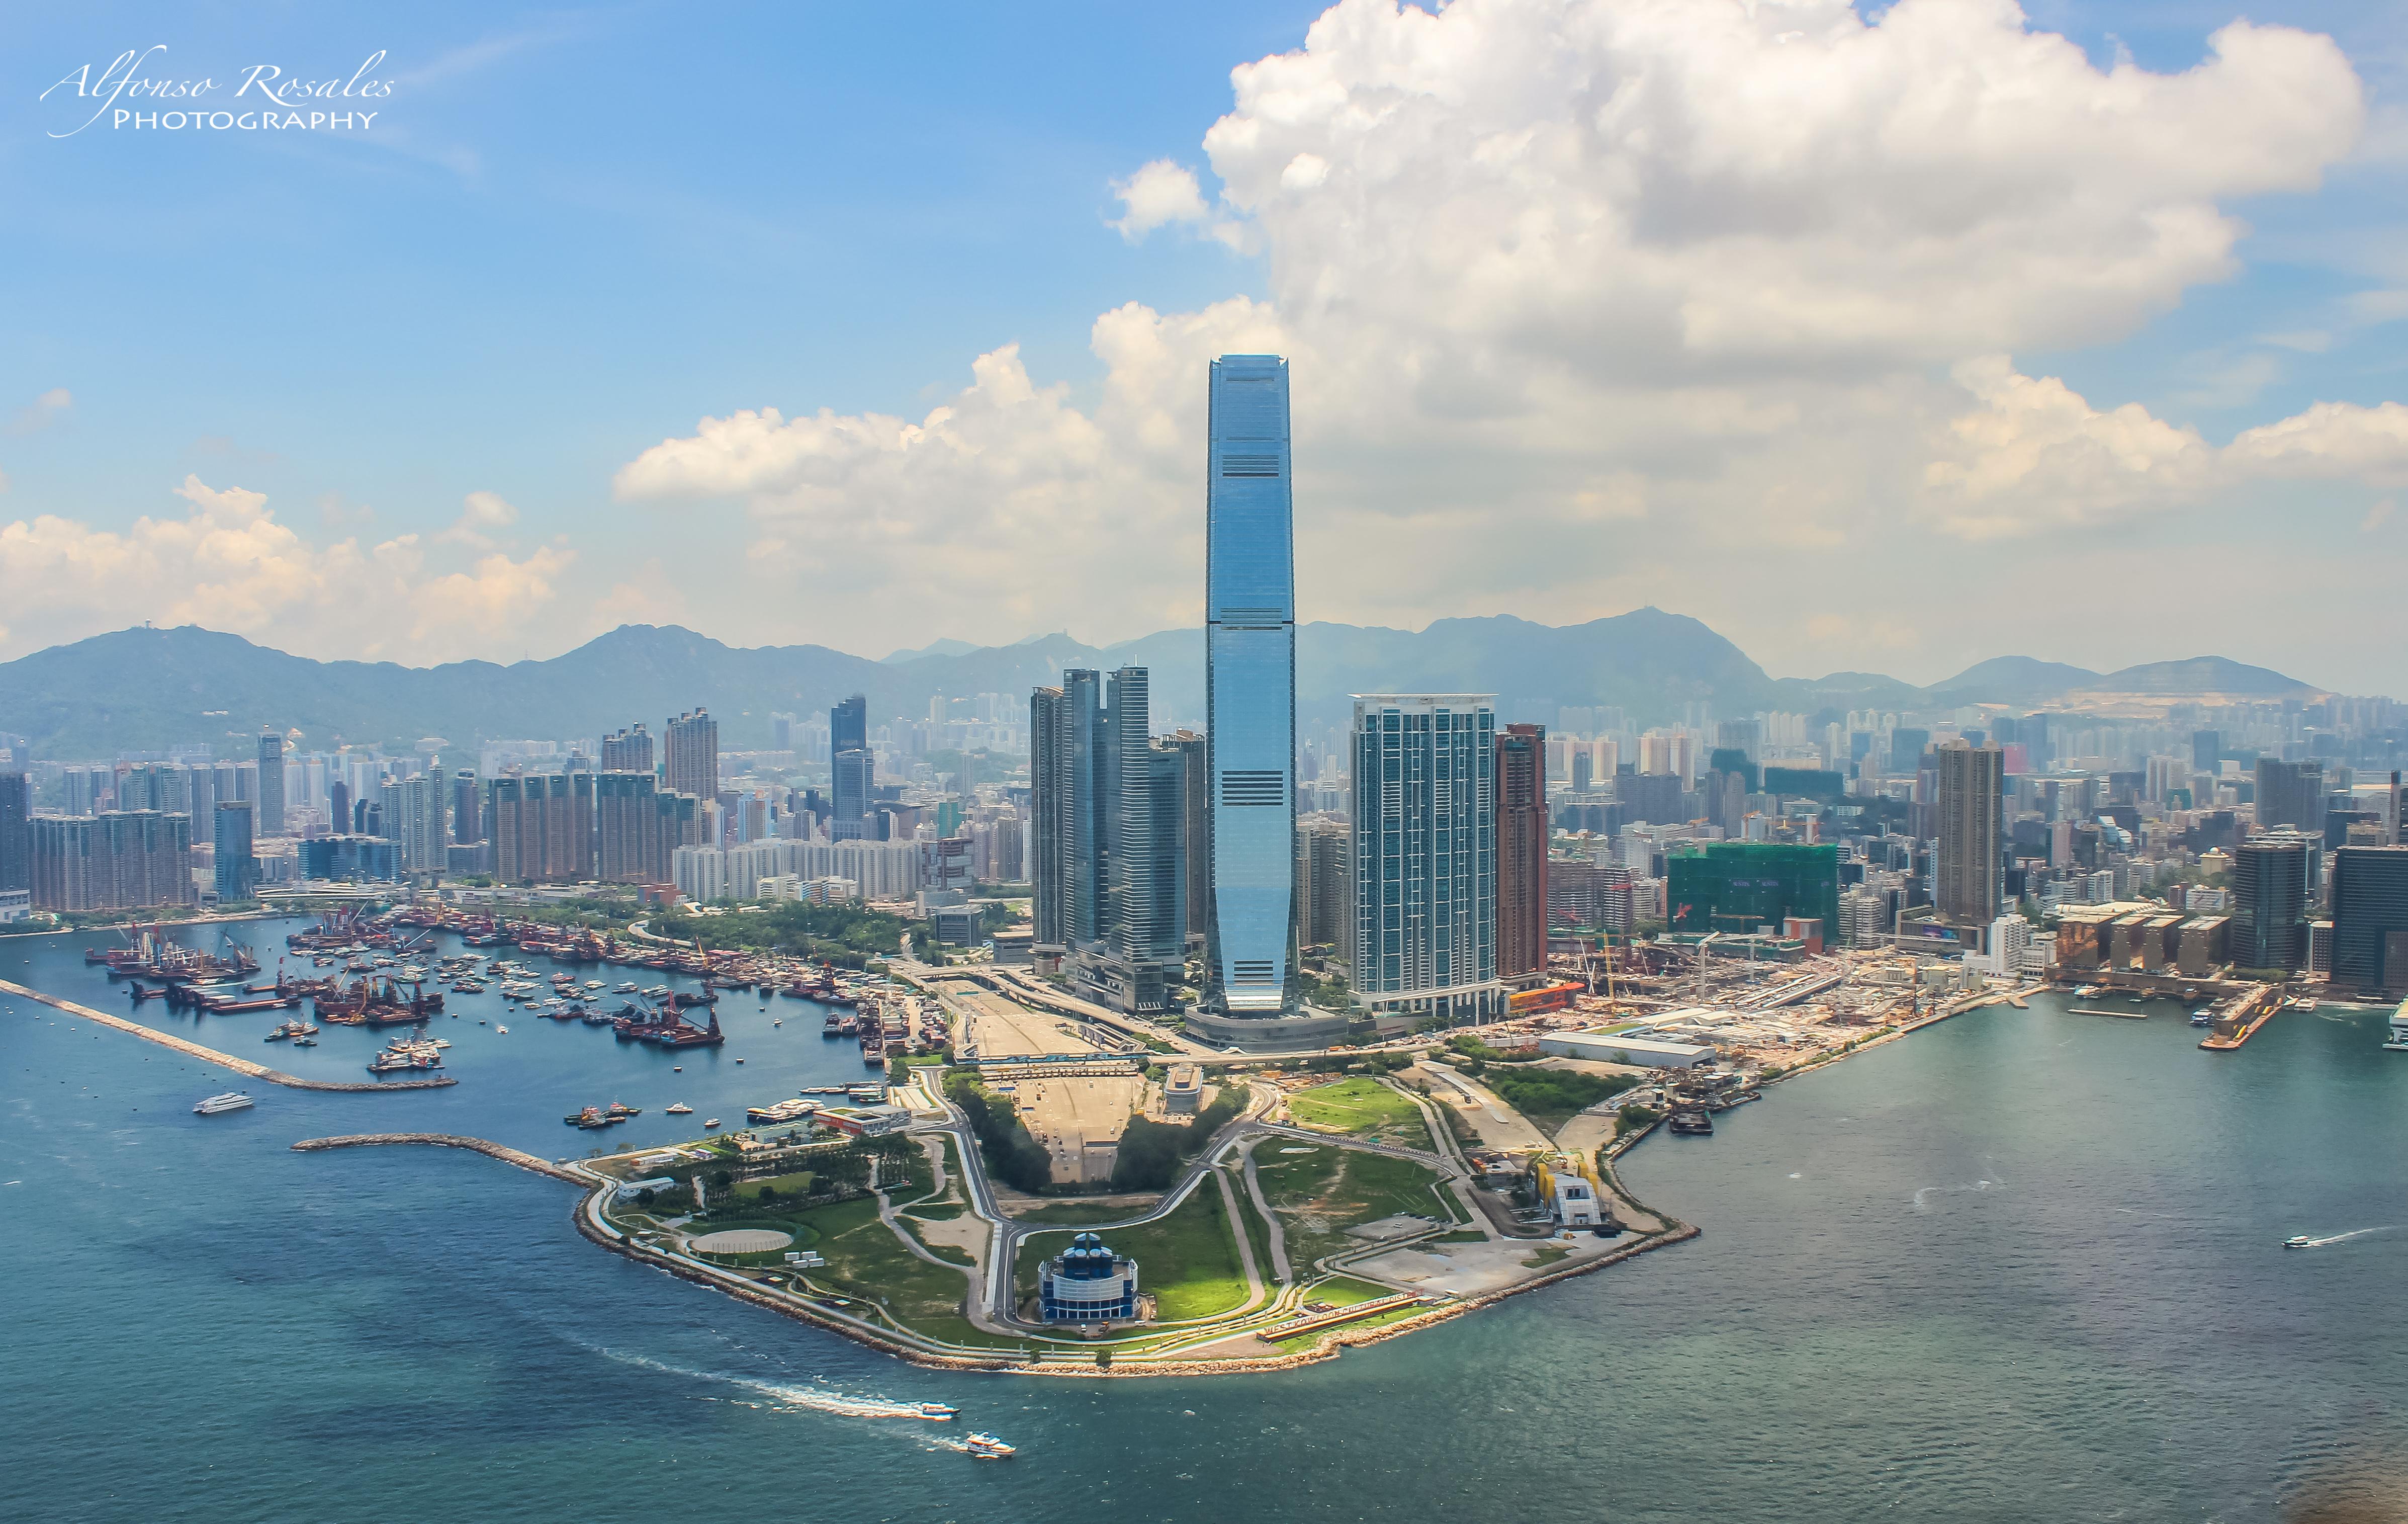 HK desde Helicomptero